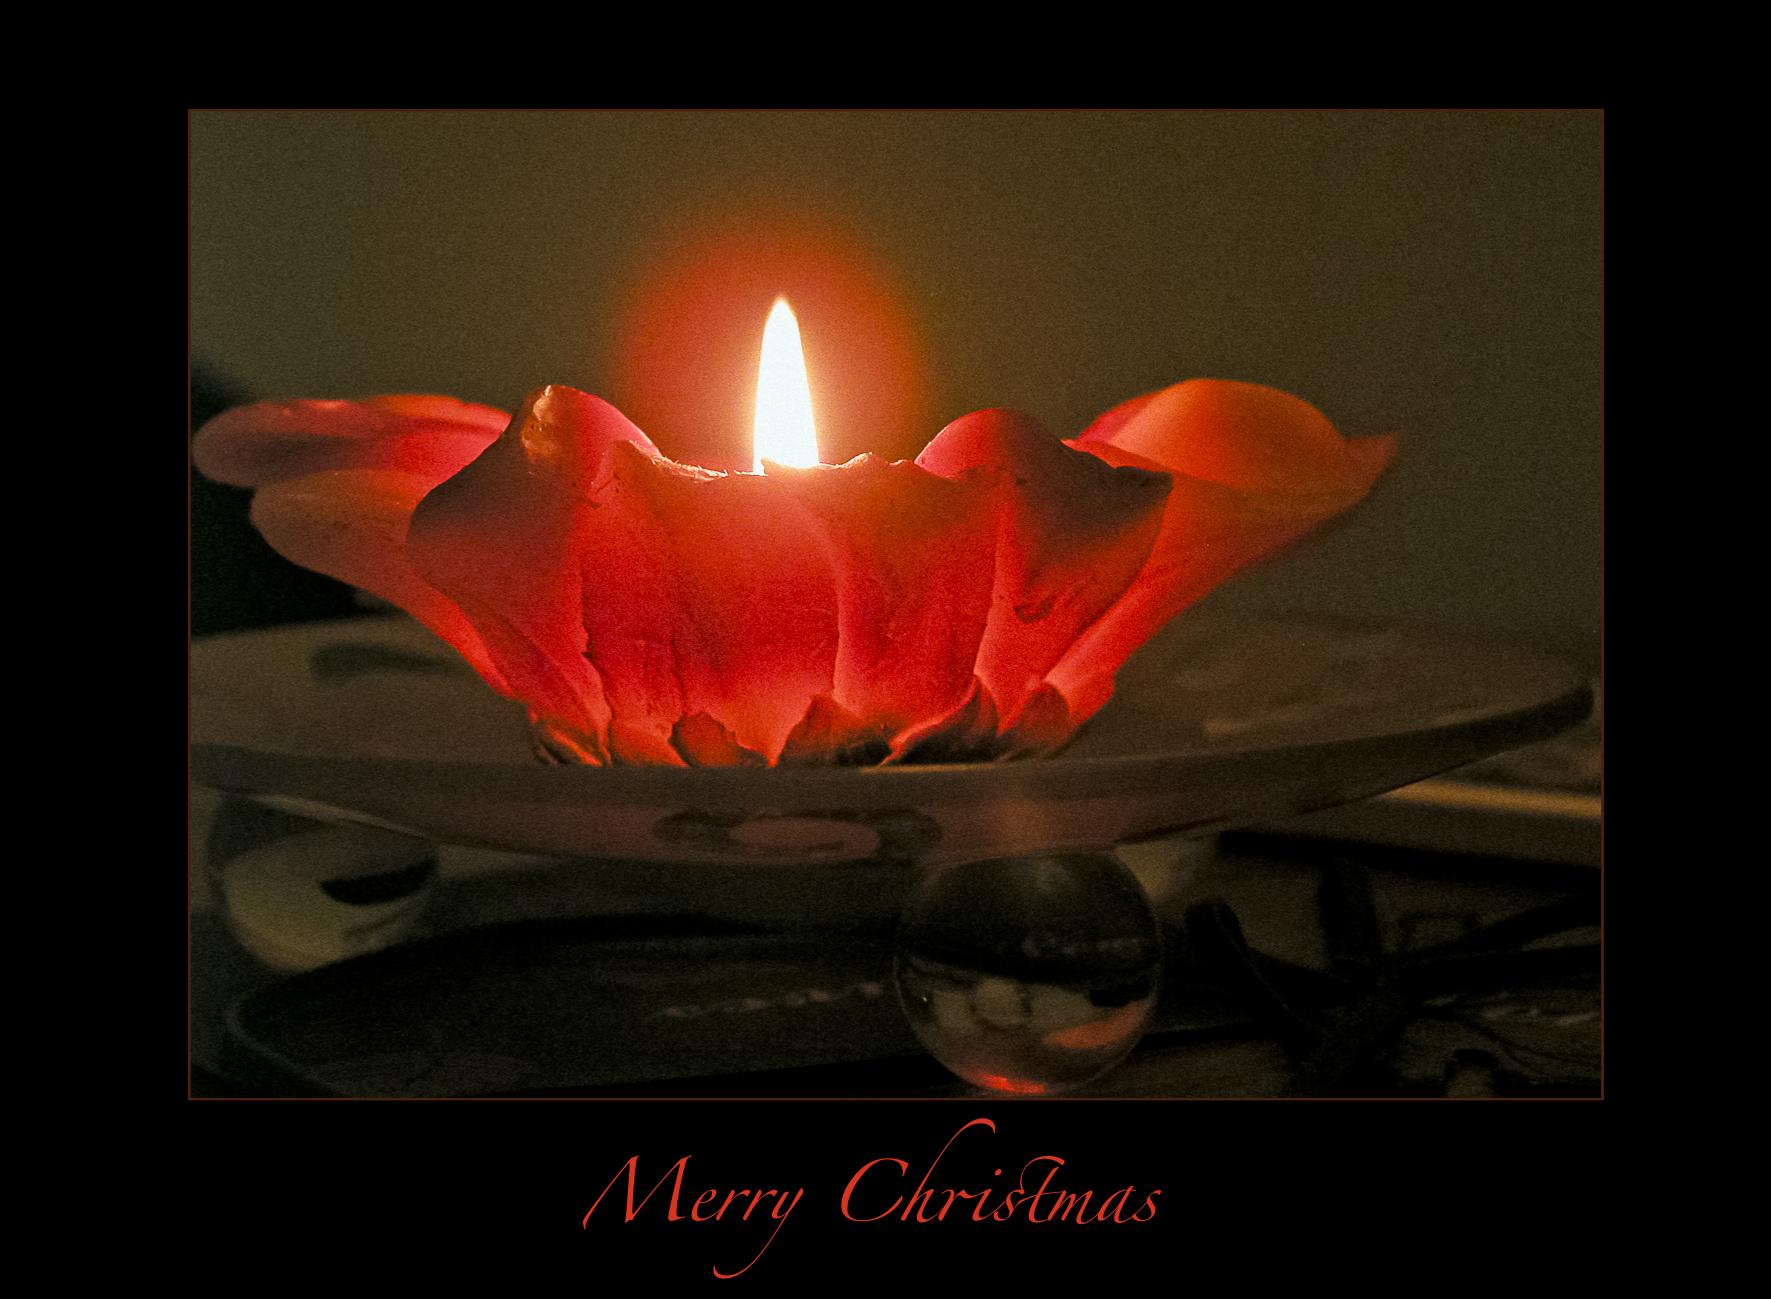 candle xmas card-2.jpg